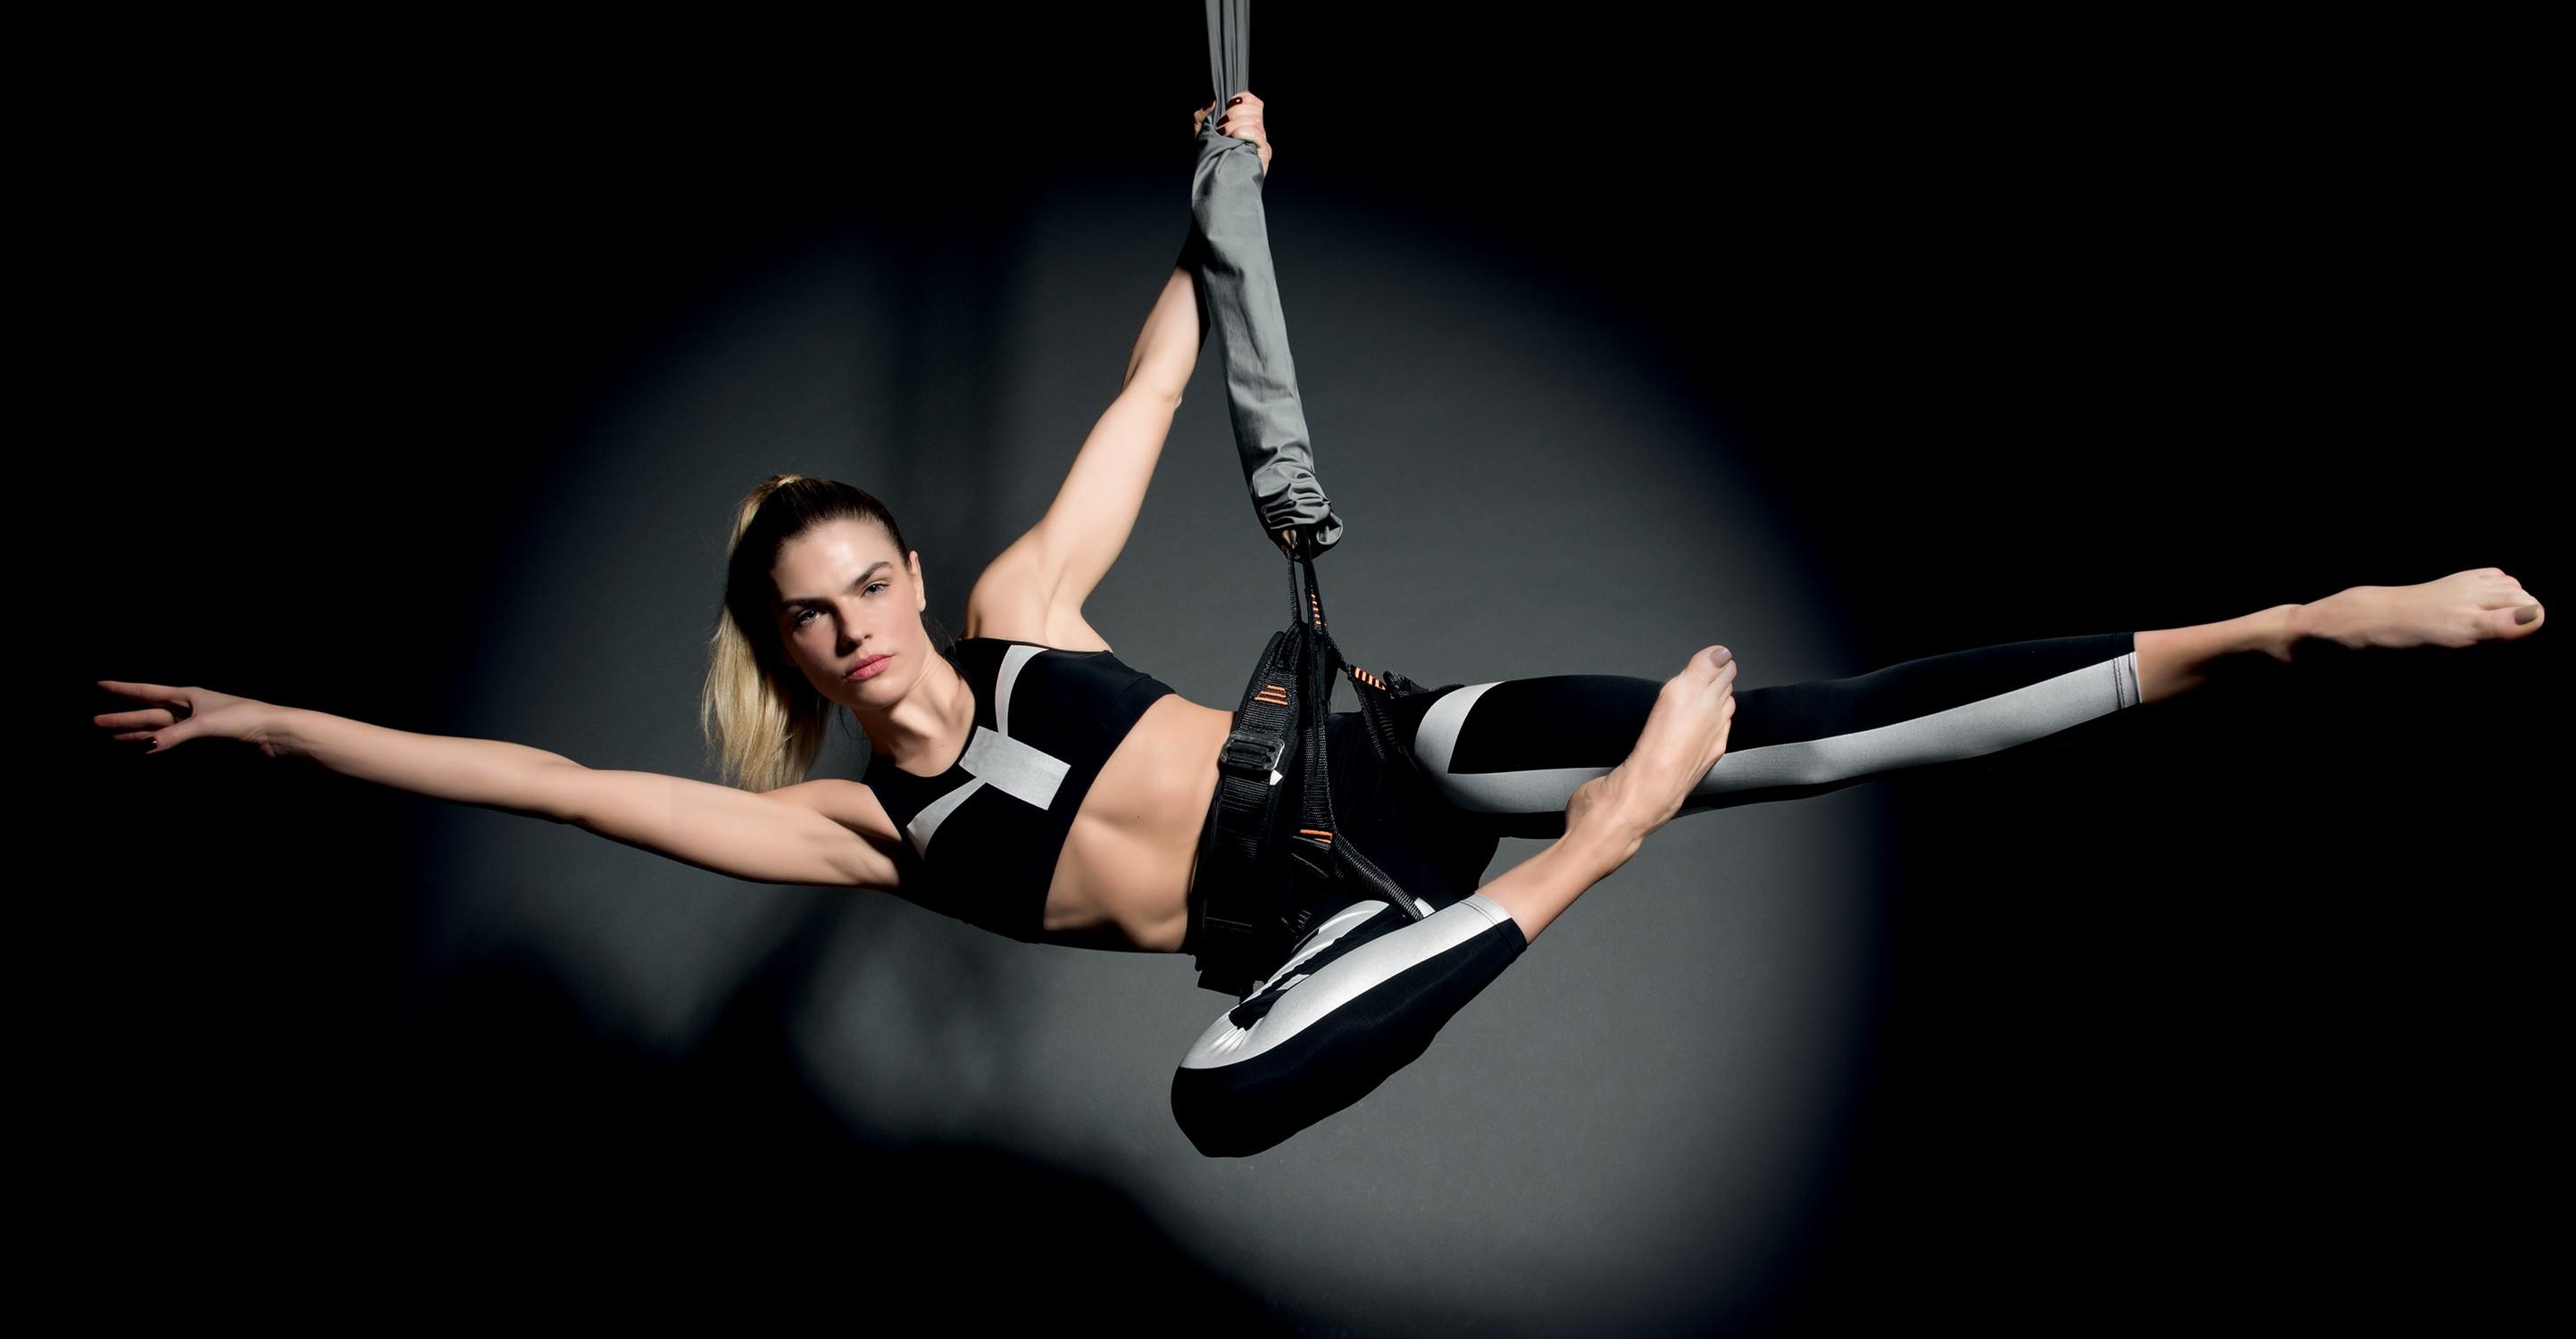 A modelo Ana Paula Scopel em movimento da nova aula Bungee Dance (Foto: Thais Vandanezi)